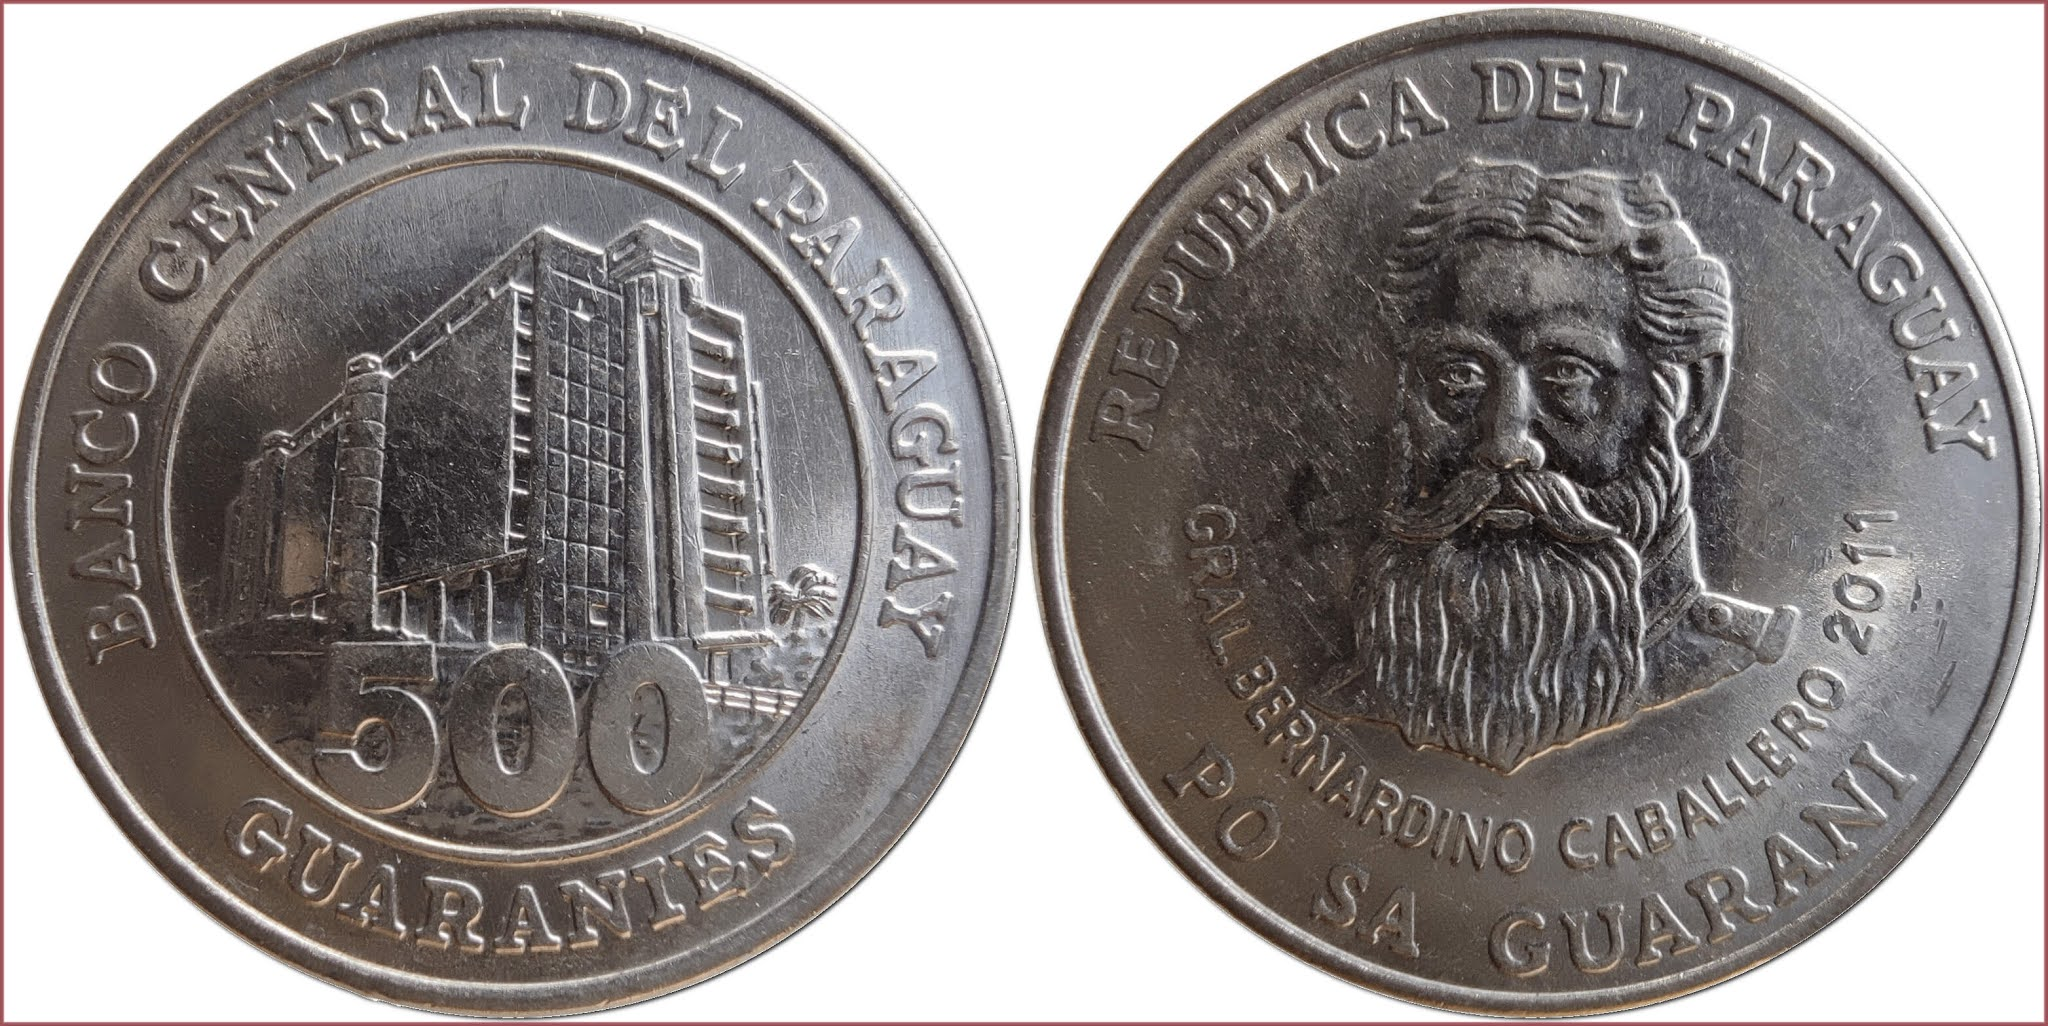 500 guarani (guaraníes), 2011: Republic of Paraguay